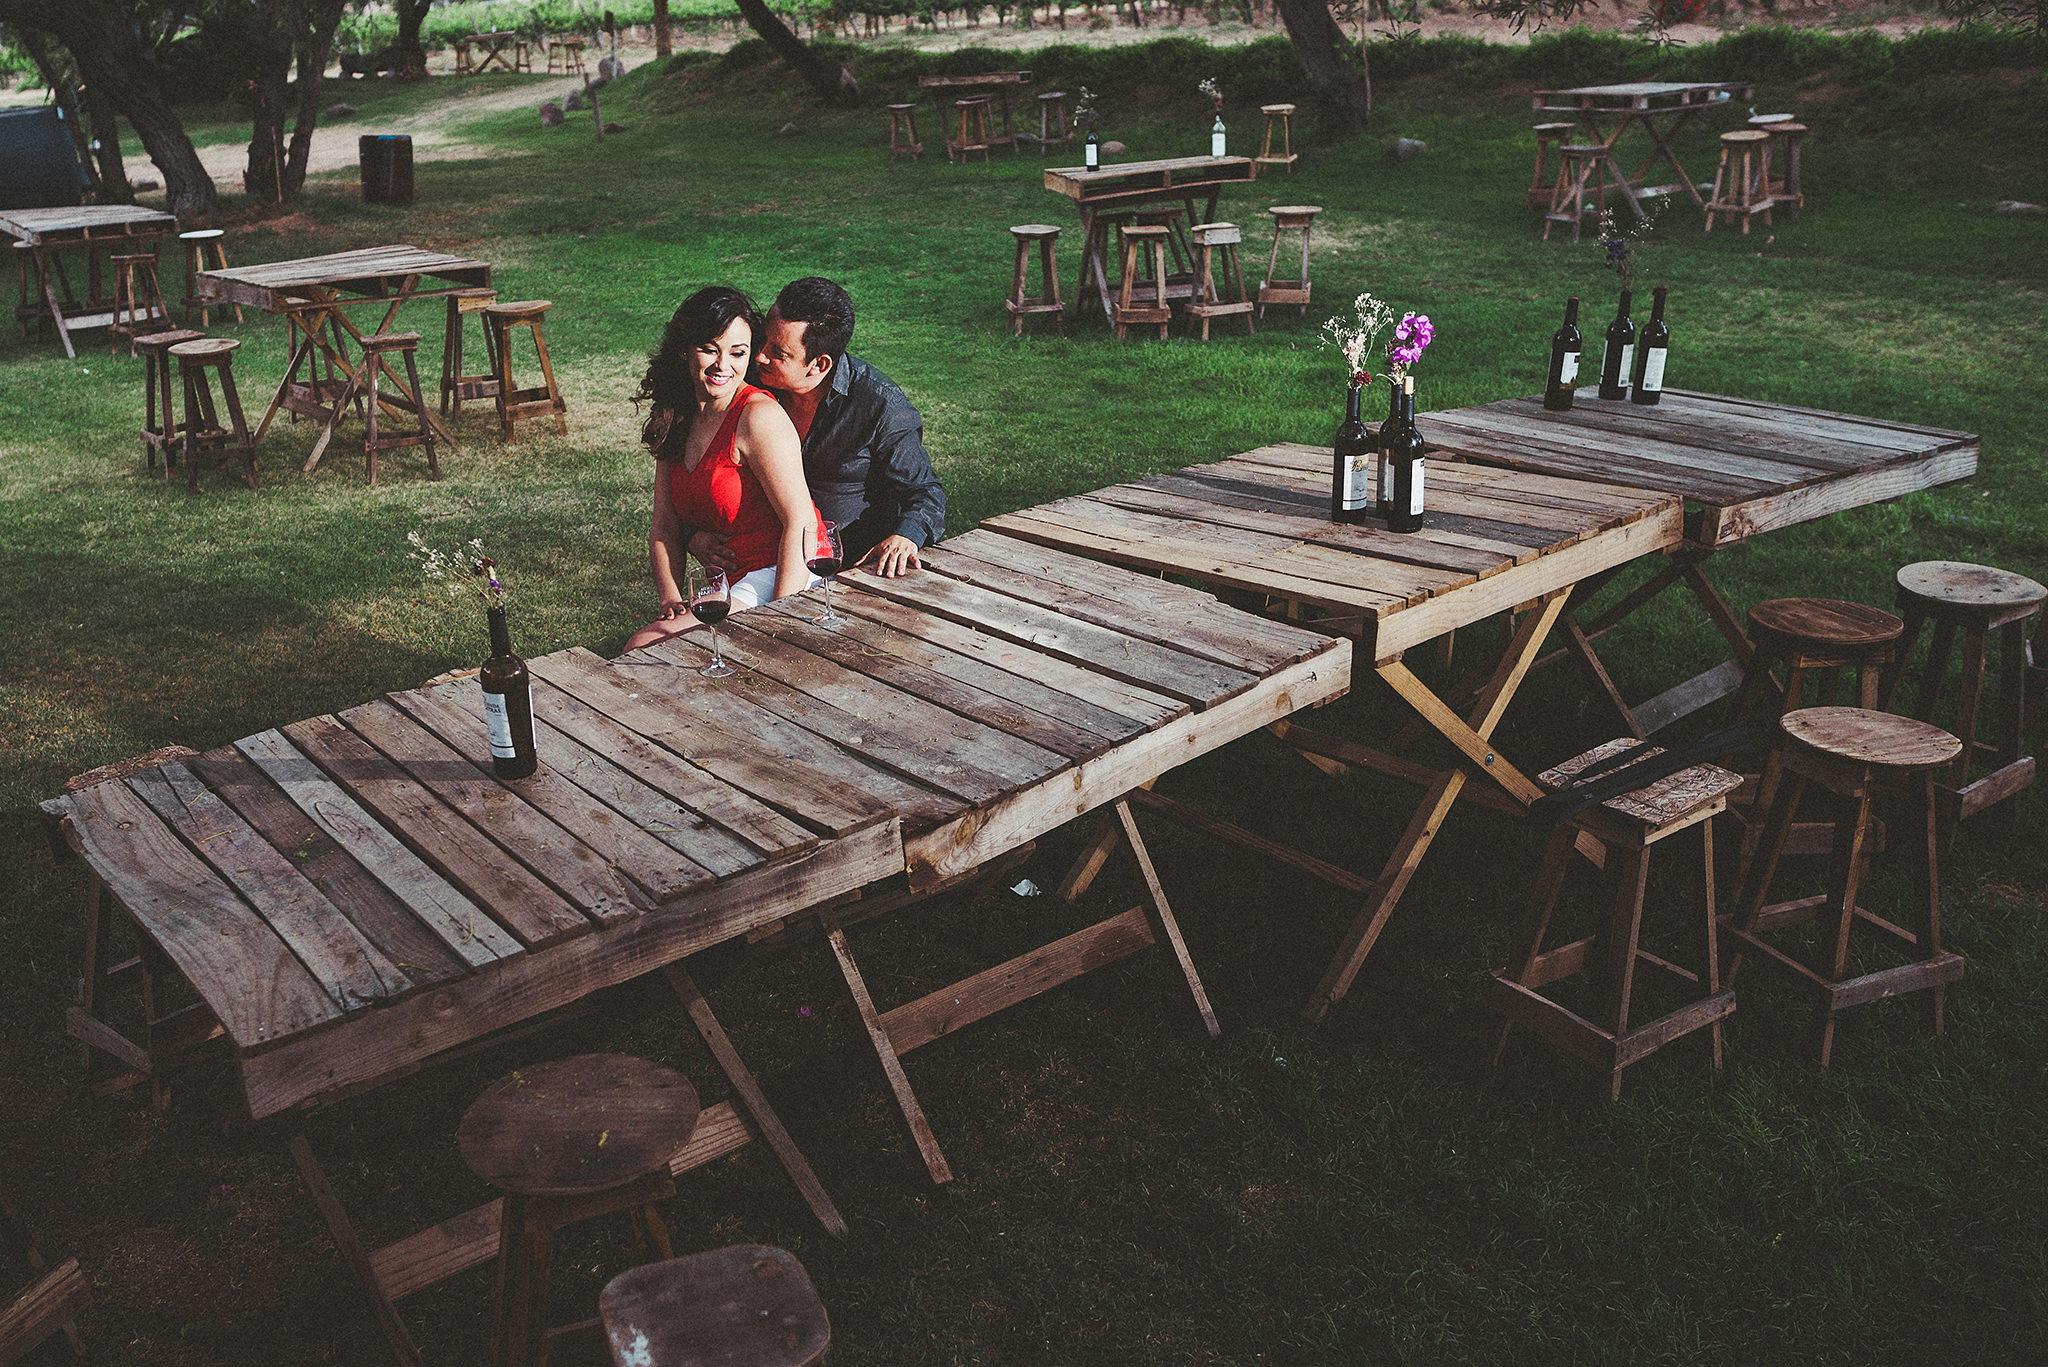 divertida-sesion-preboda-vinedo-hacienda-de-letras-pabellon-de-arteaga-luis-houdin-fotografo146